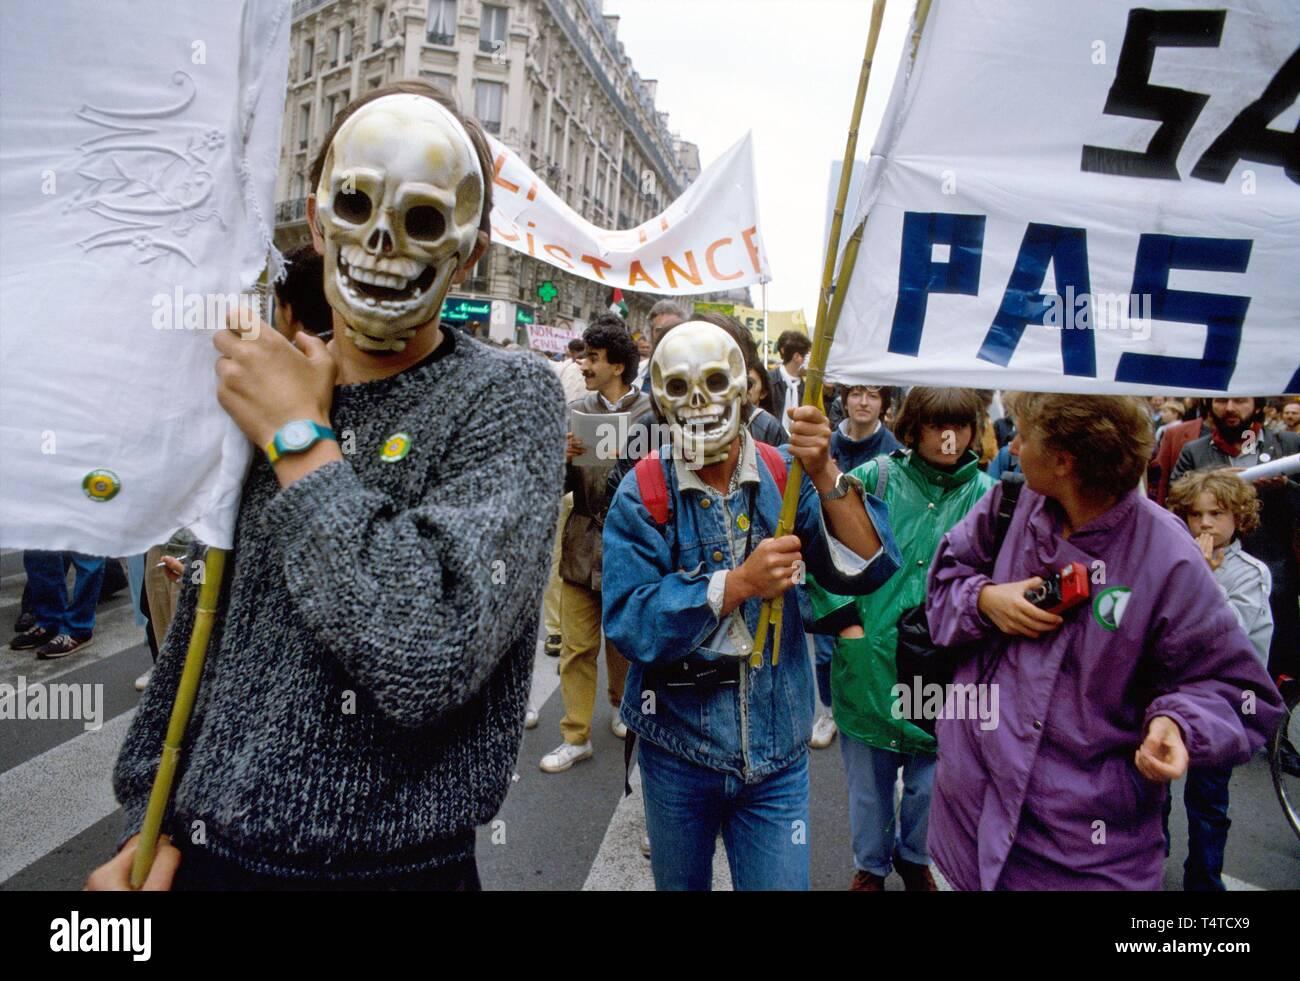 Antinuclear manifestazione a Parigi, in Francia, giugno 1987 Immagini Stock